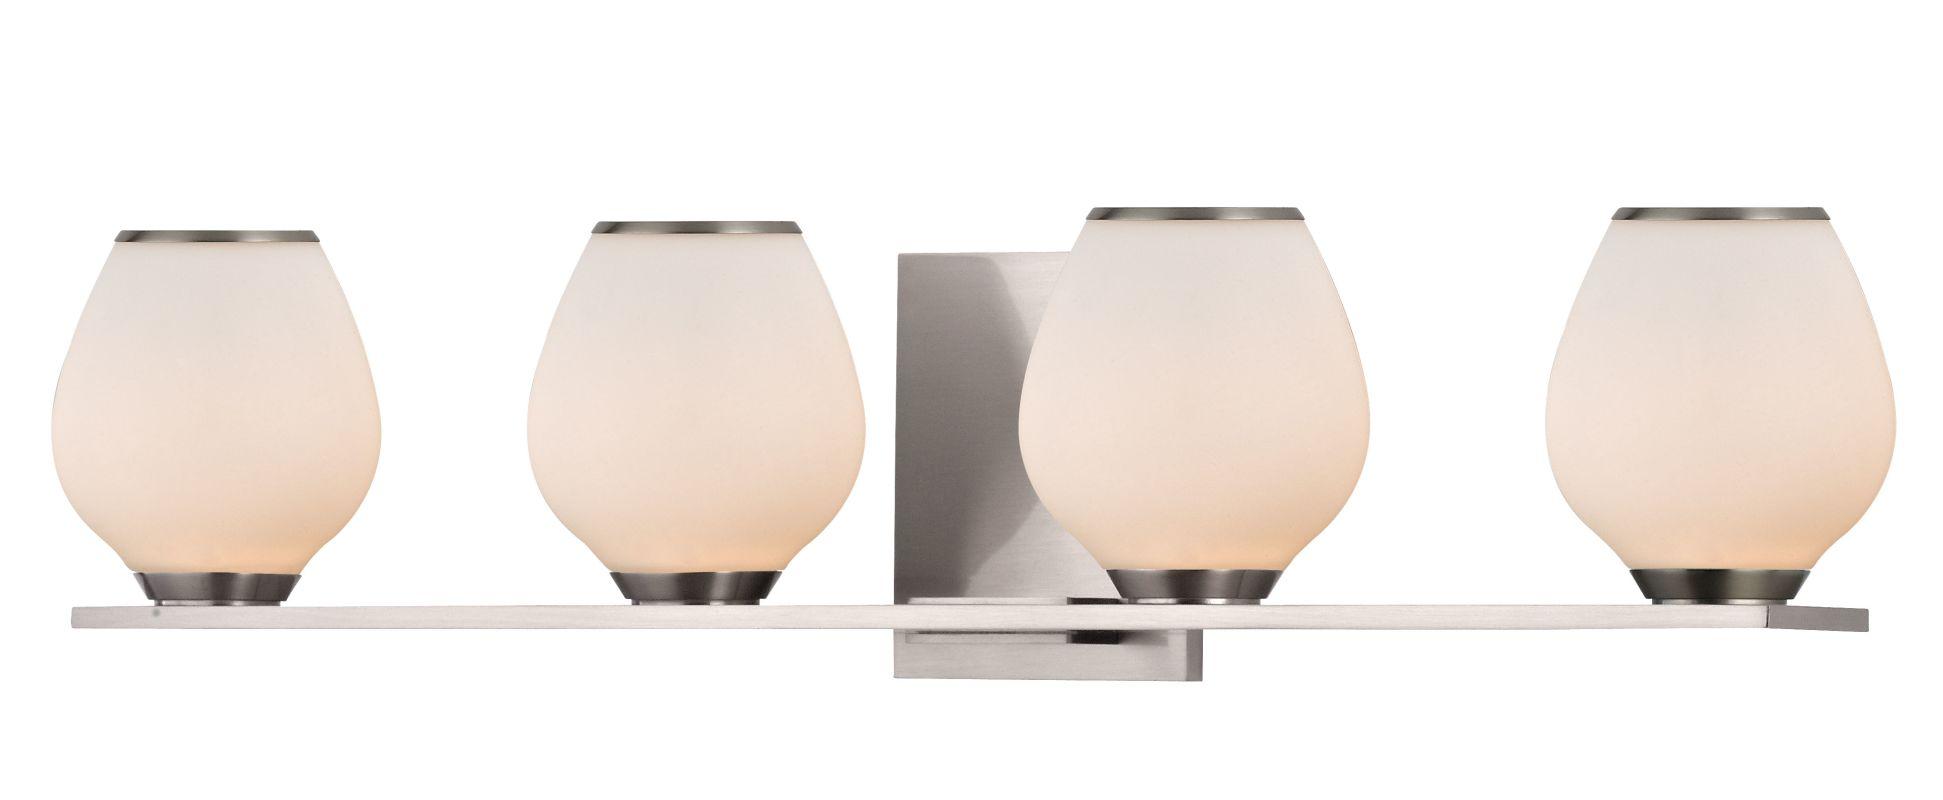 Hudson Valley Lighting 1194 Verona 4 Light Xenon Bathroom Vanity Light Sale $193.60 ITEM#: 2295068 MODEL# :1194-SN UPC#: 806134158903 :